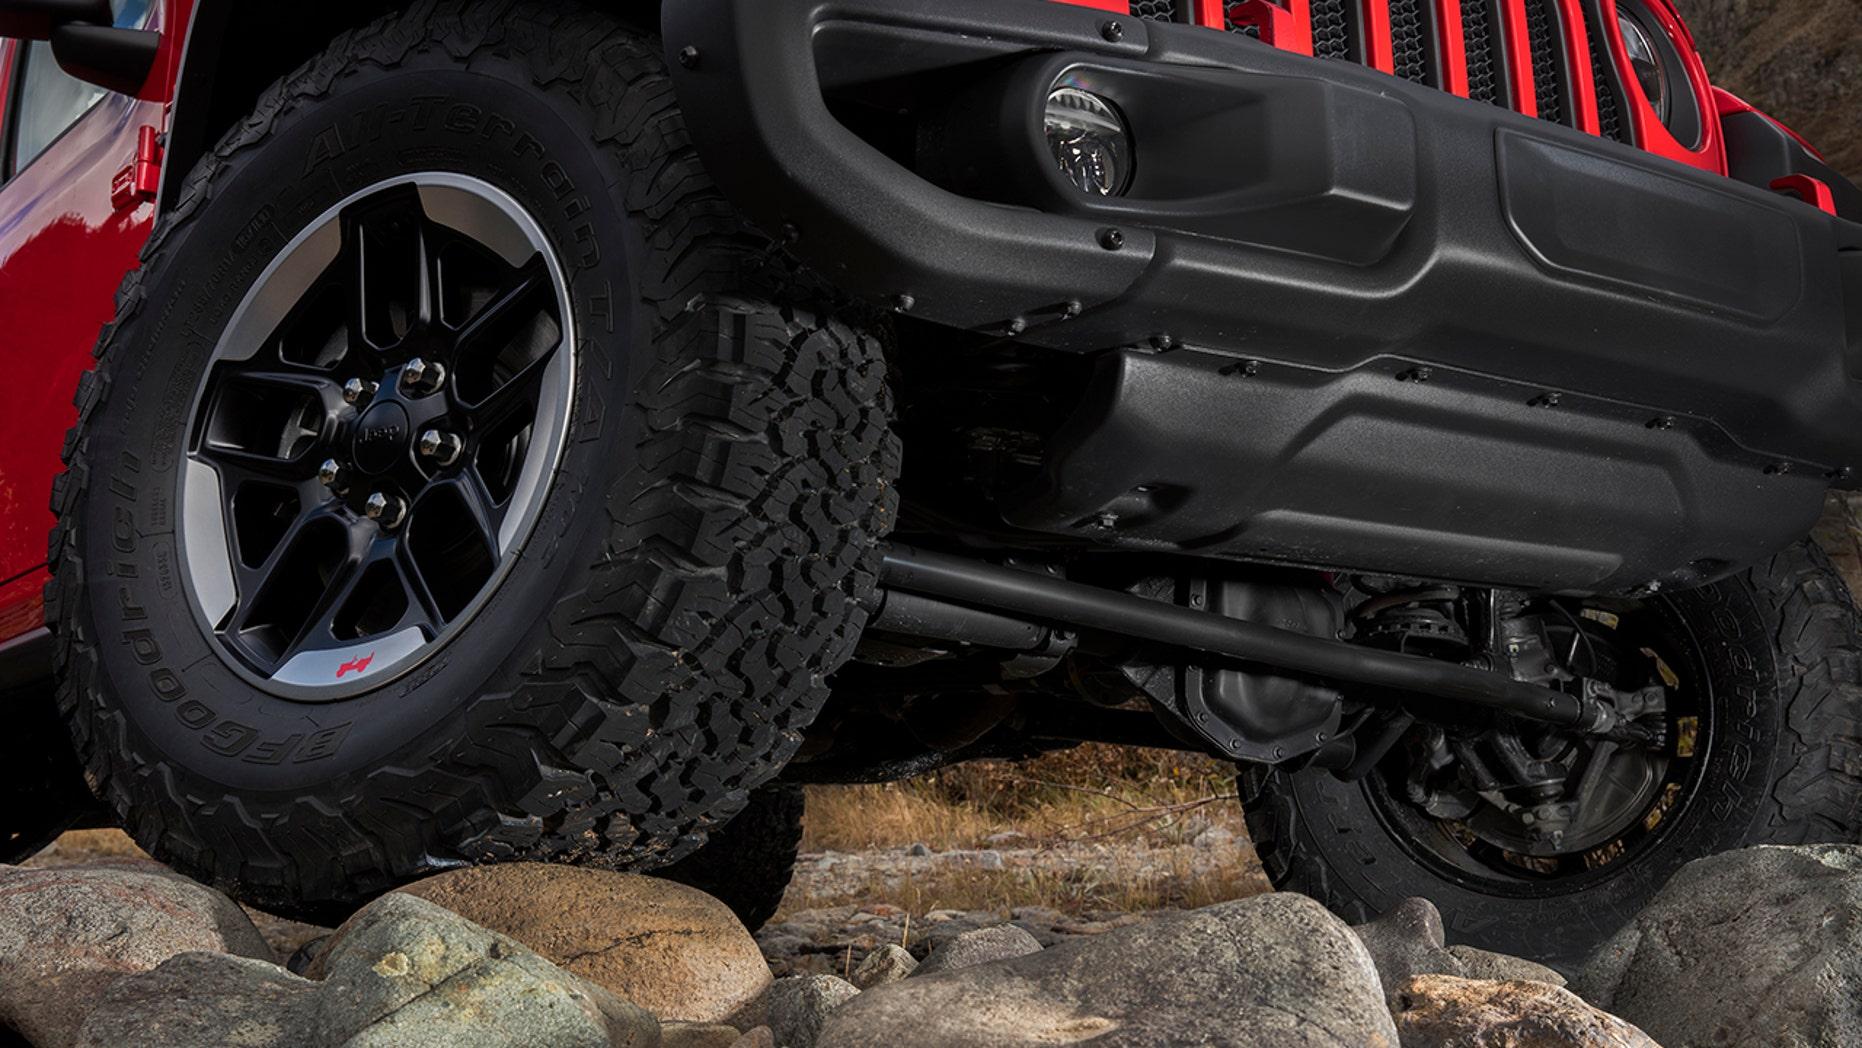 Jeep Wrangler Under Investigation